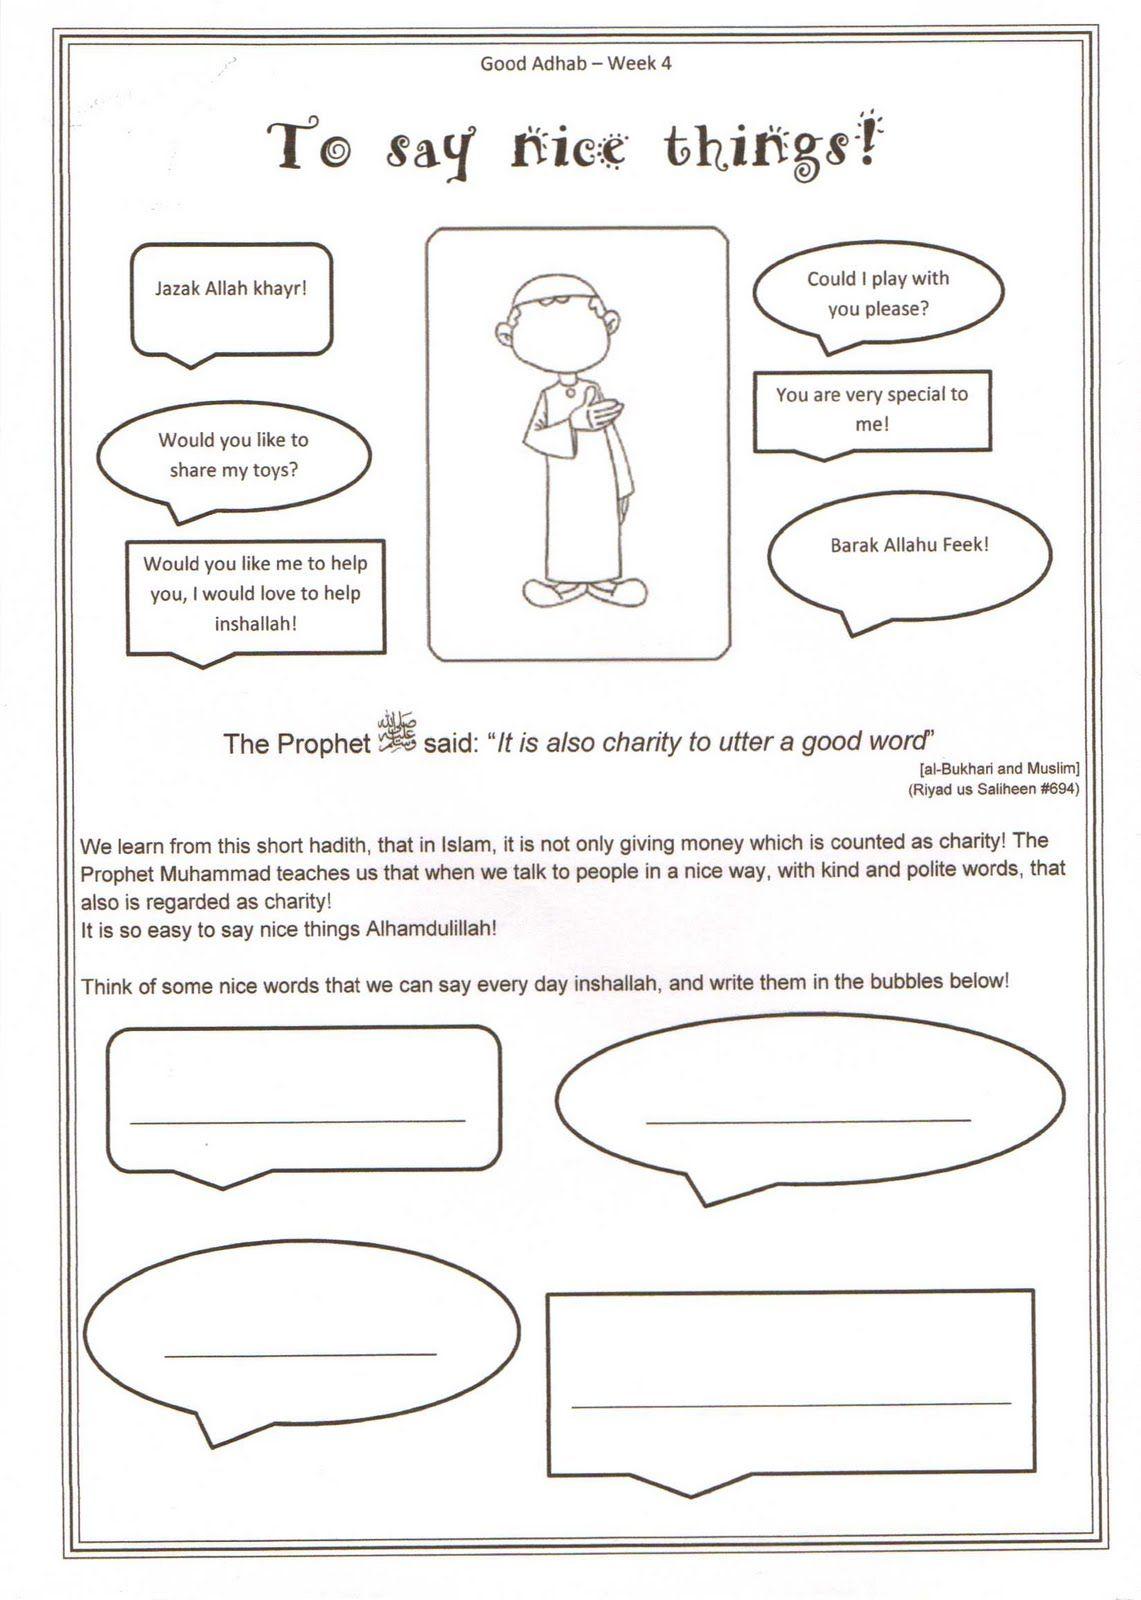 hight resolution of Diary of a Muslim homeschool: Good Adhab - Week 4: saying a good word is  charity!   Islamic studies